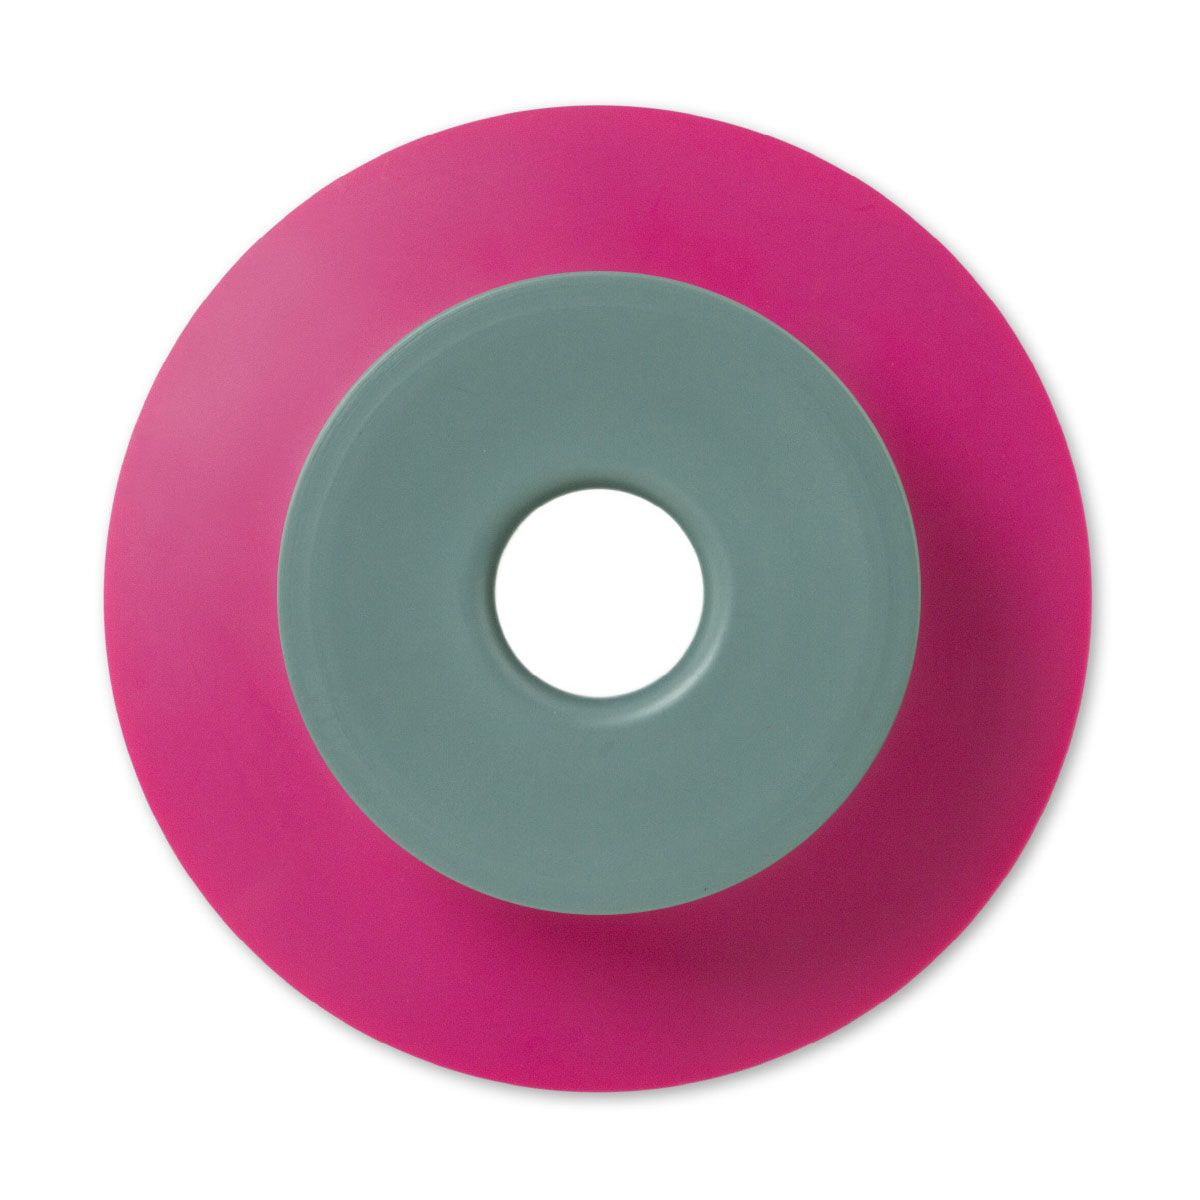 PLA Filament | Color: Glossy Violet